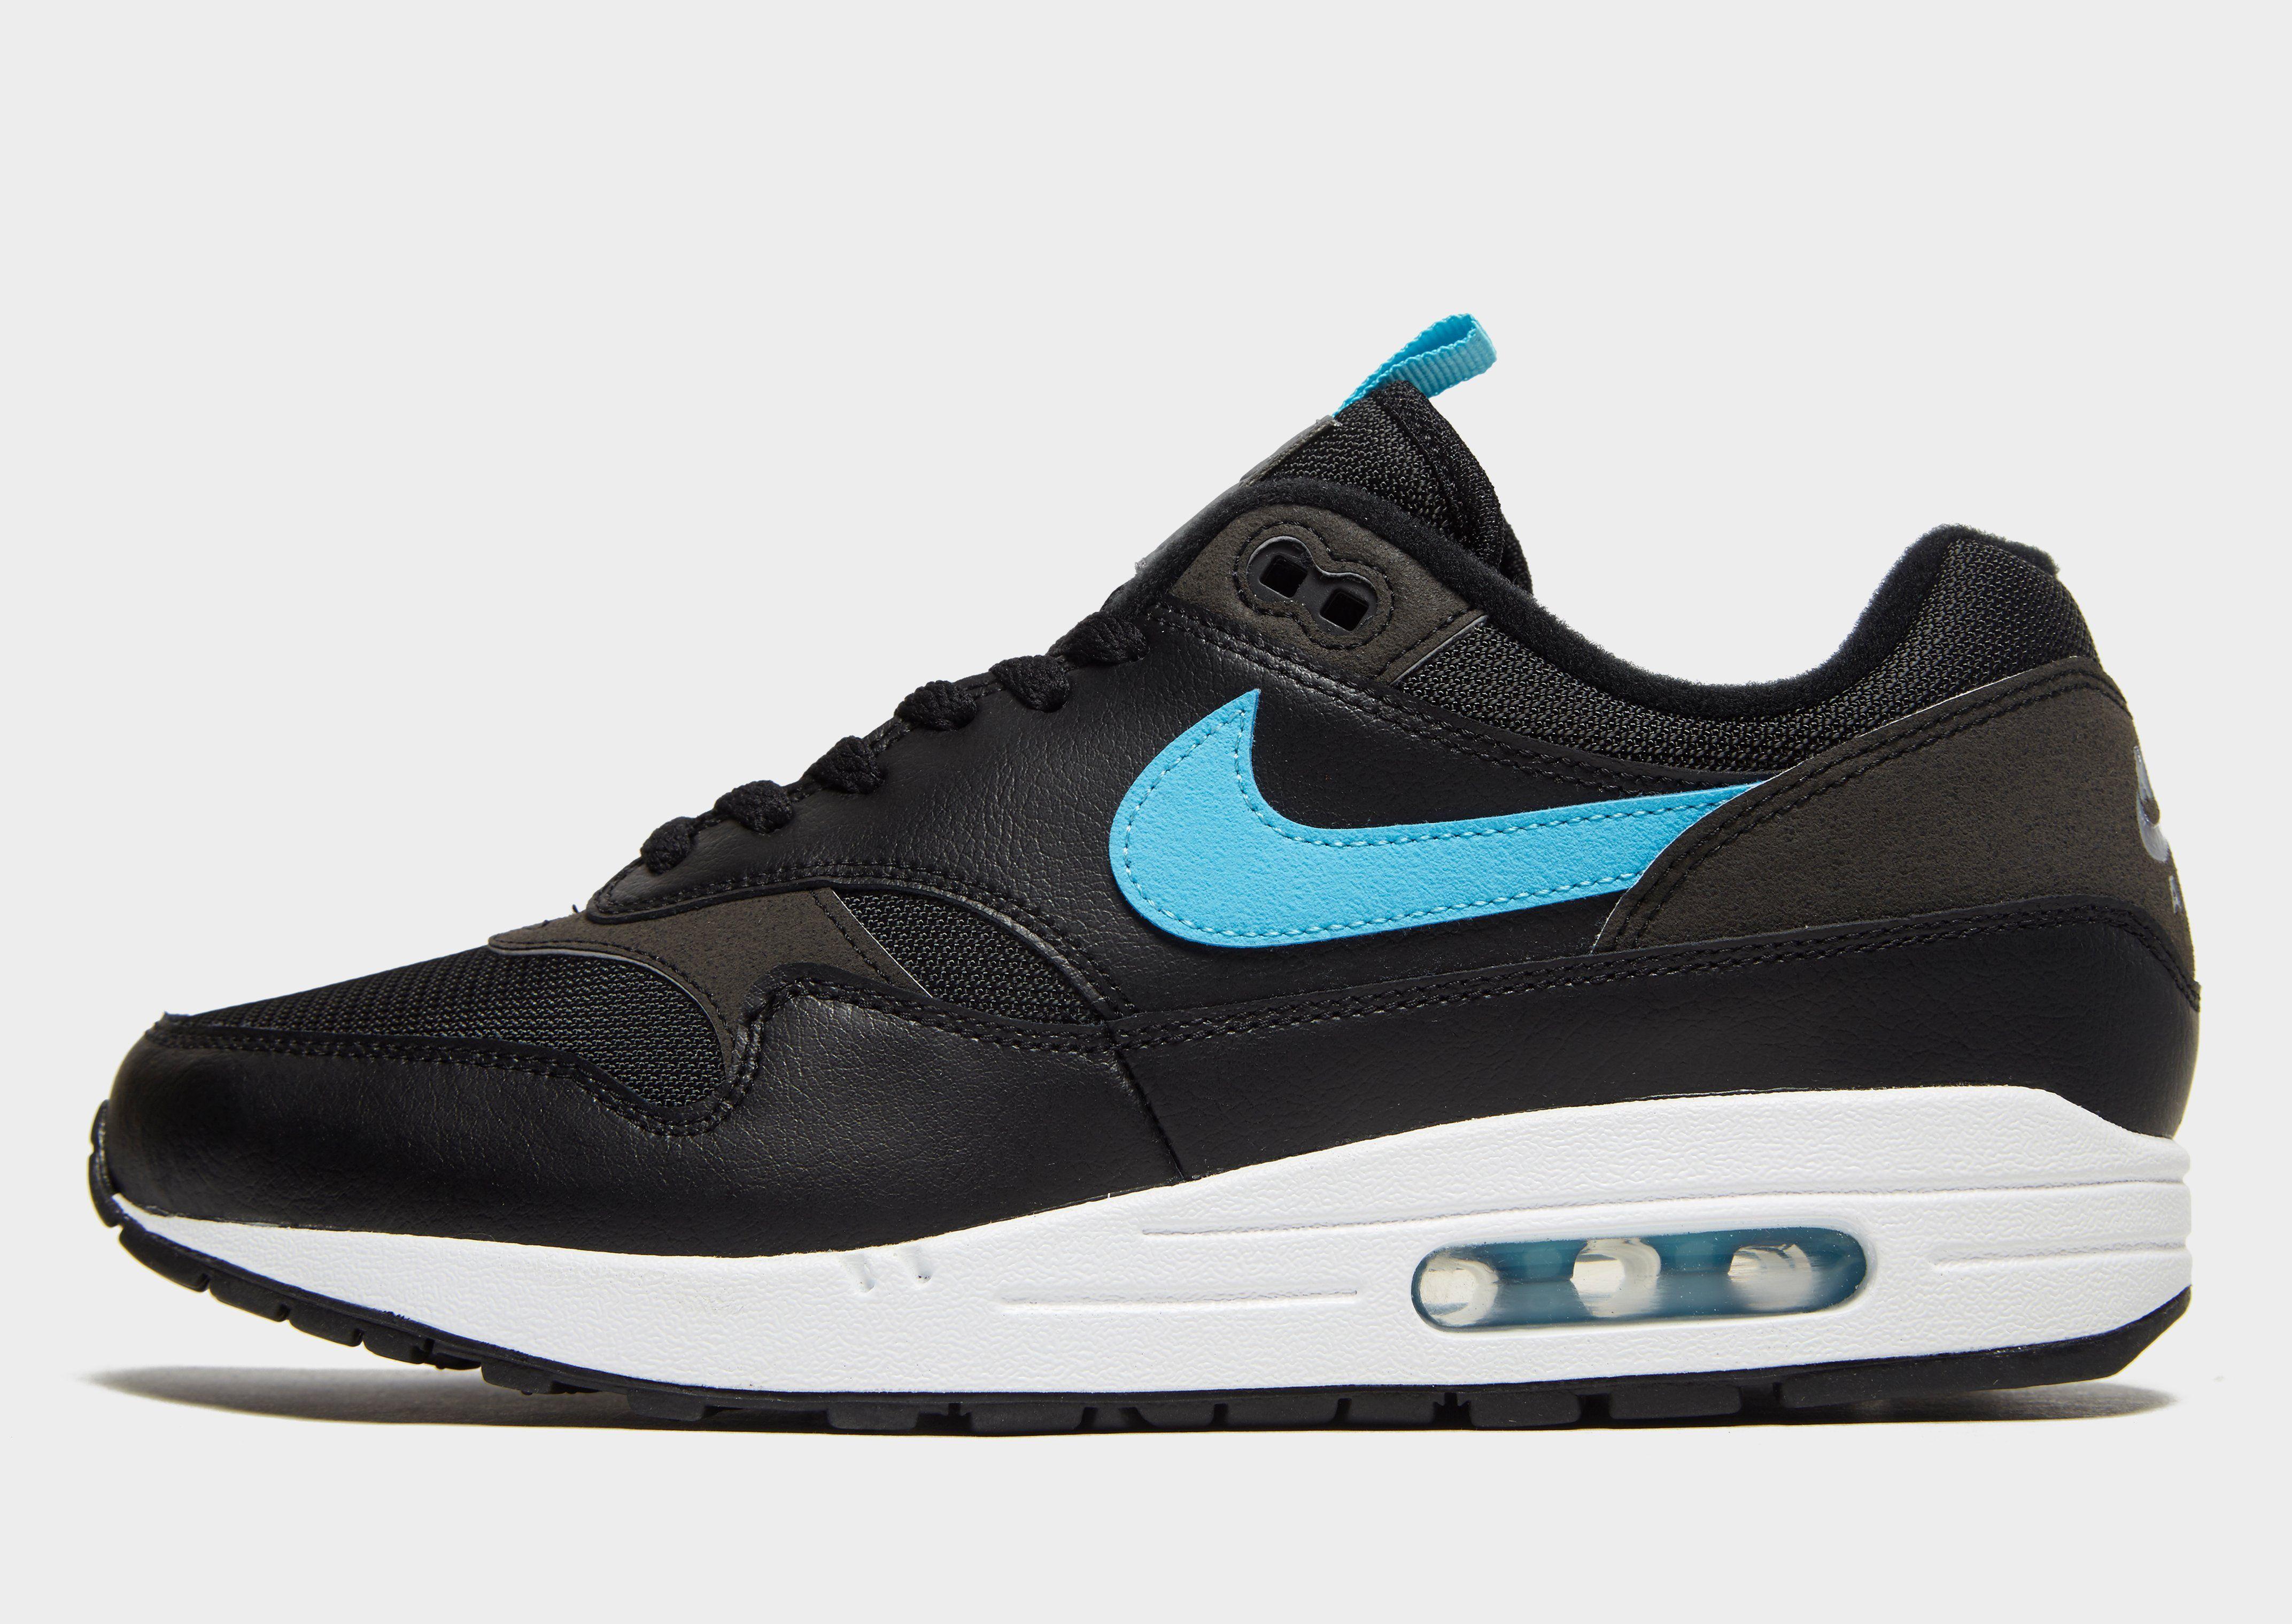 pretty nice 5d68a 71f0f Nike Running Nike Air Max 1 SE Men's Shoe | JD Sports